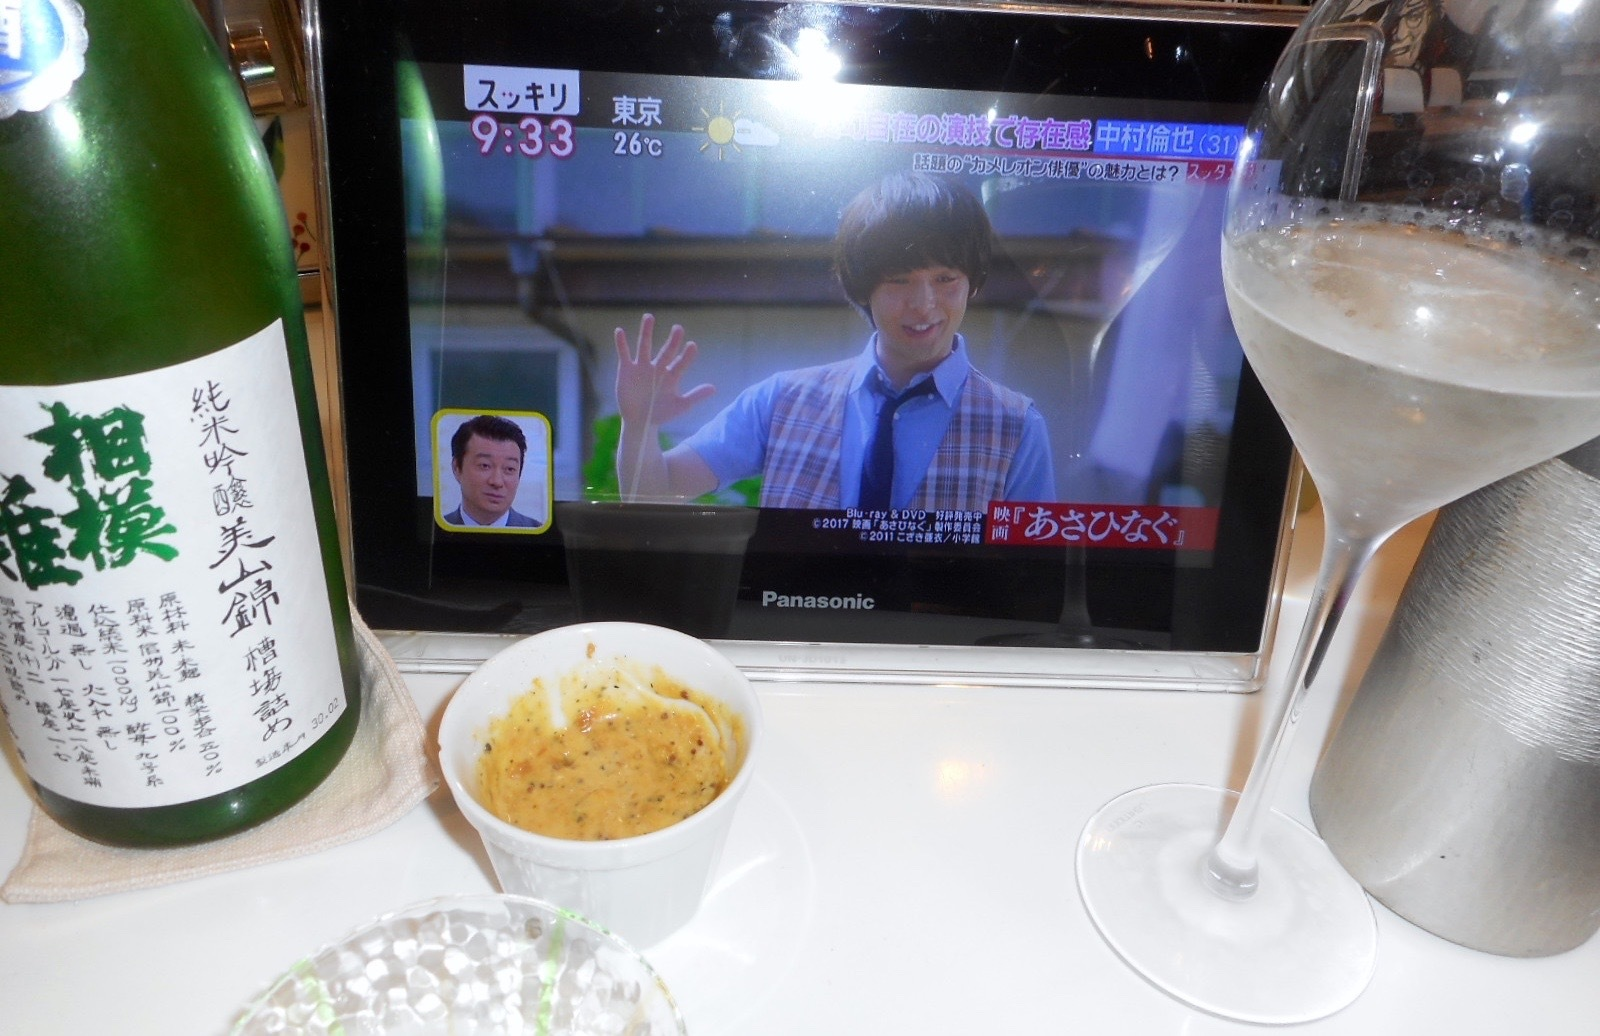 sagaminada_miyamanishiki50_29by7.jpg